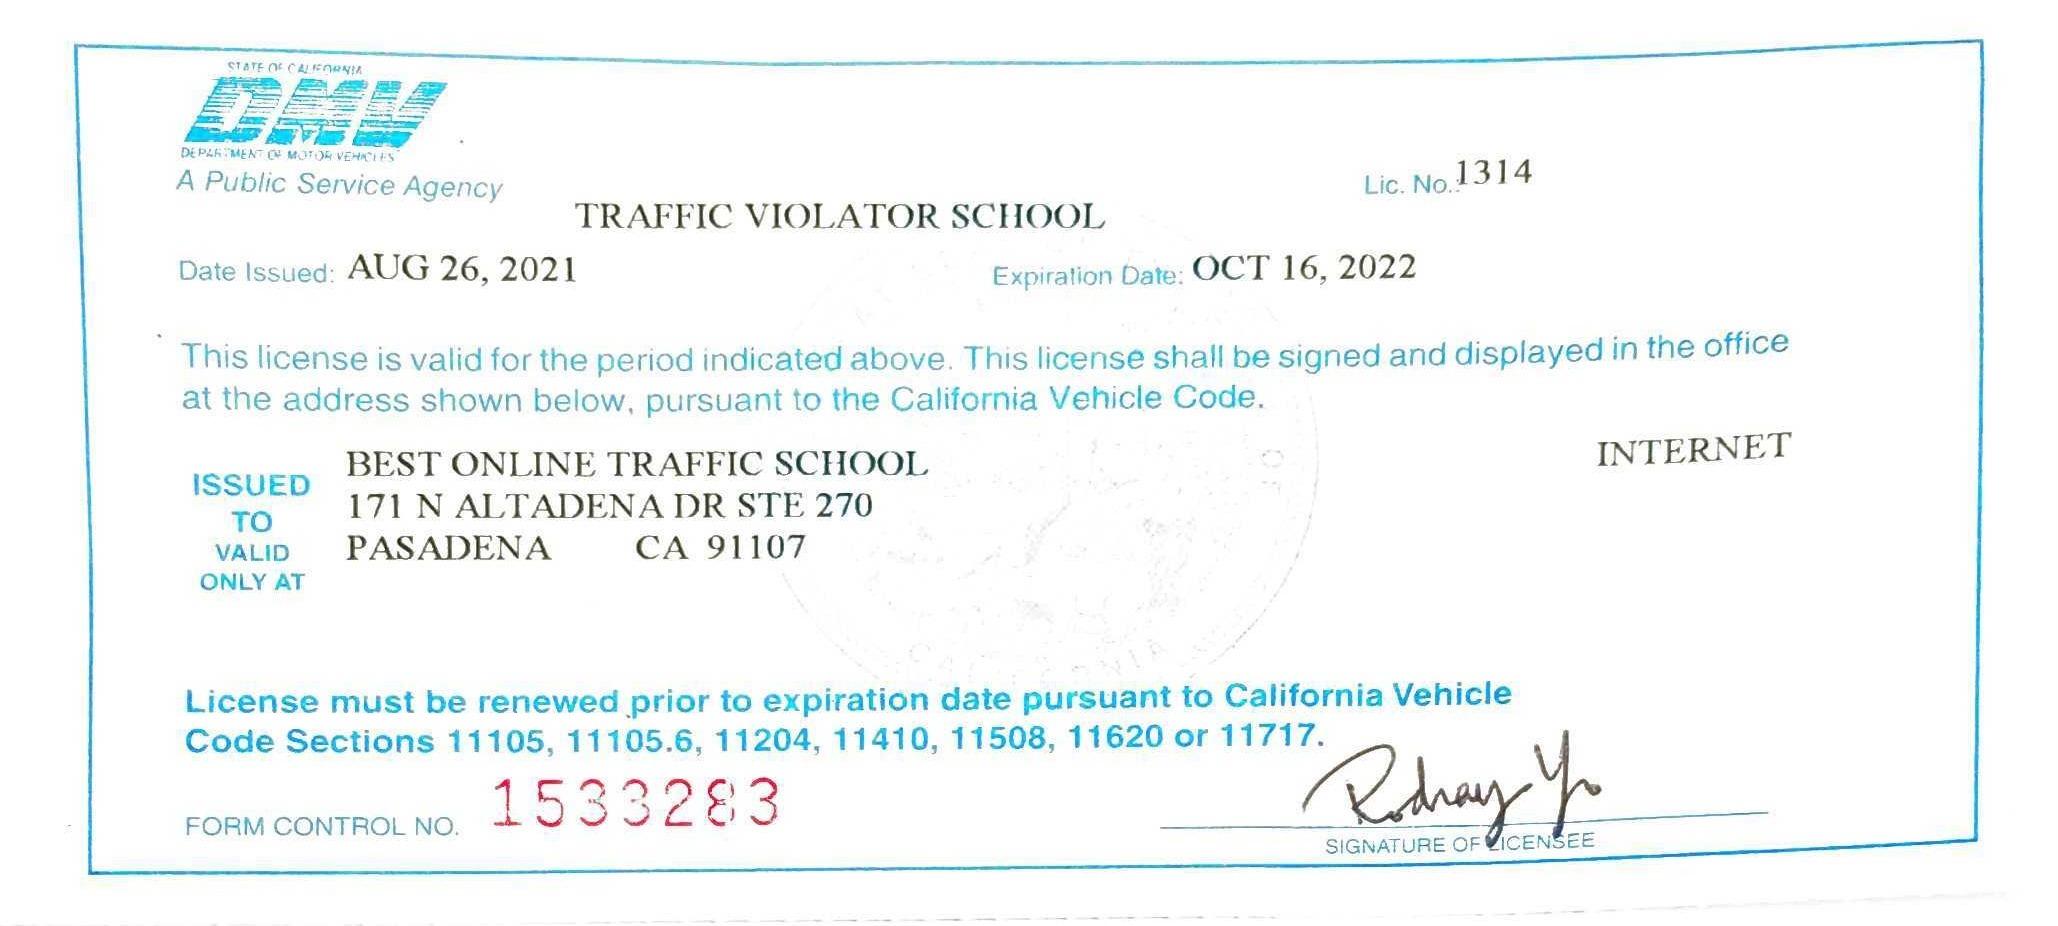 Traffic Violator School License